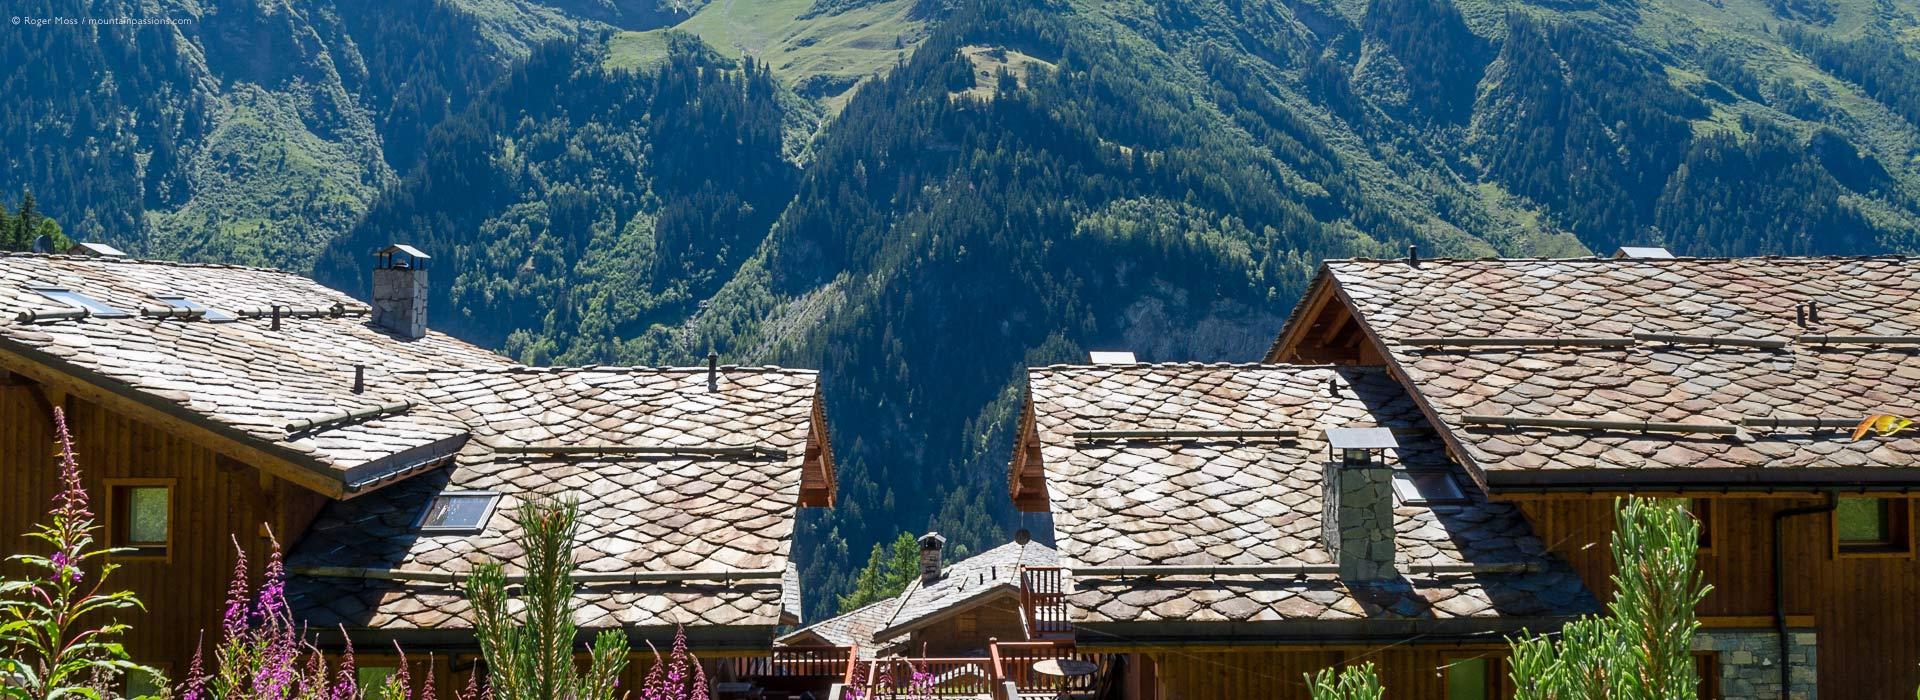 Sainte-Foy-Tarentaise chalet roofs